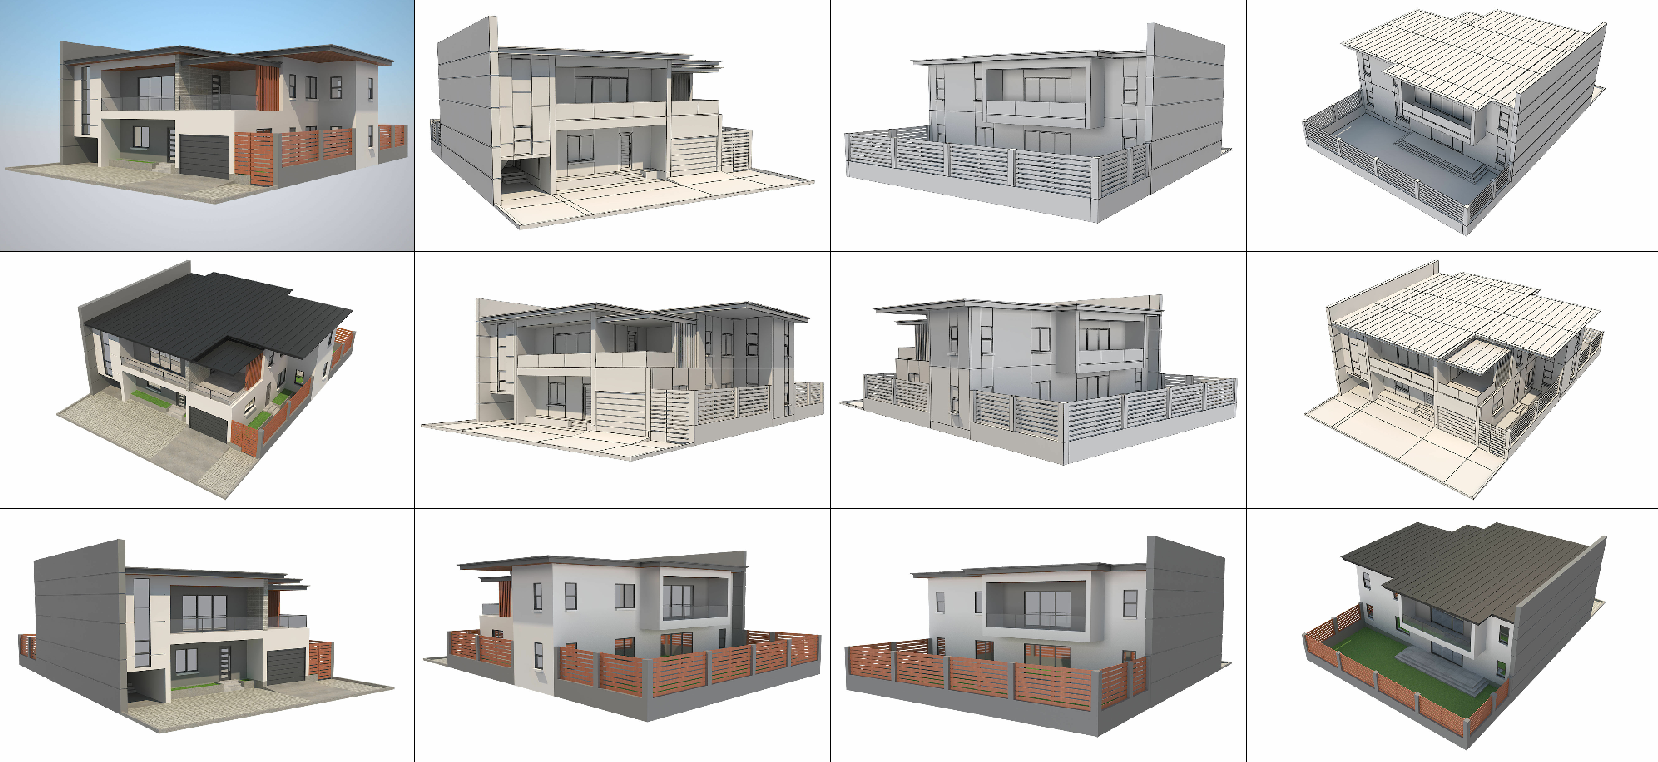 Modern House Free 3D model [3DS, FBX, OBJ, Maya,]